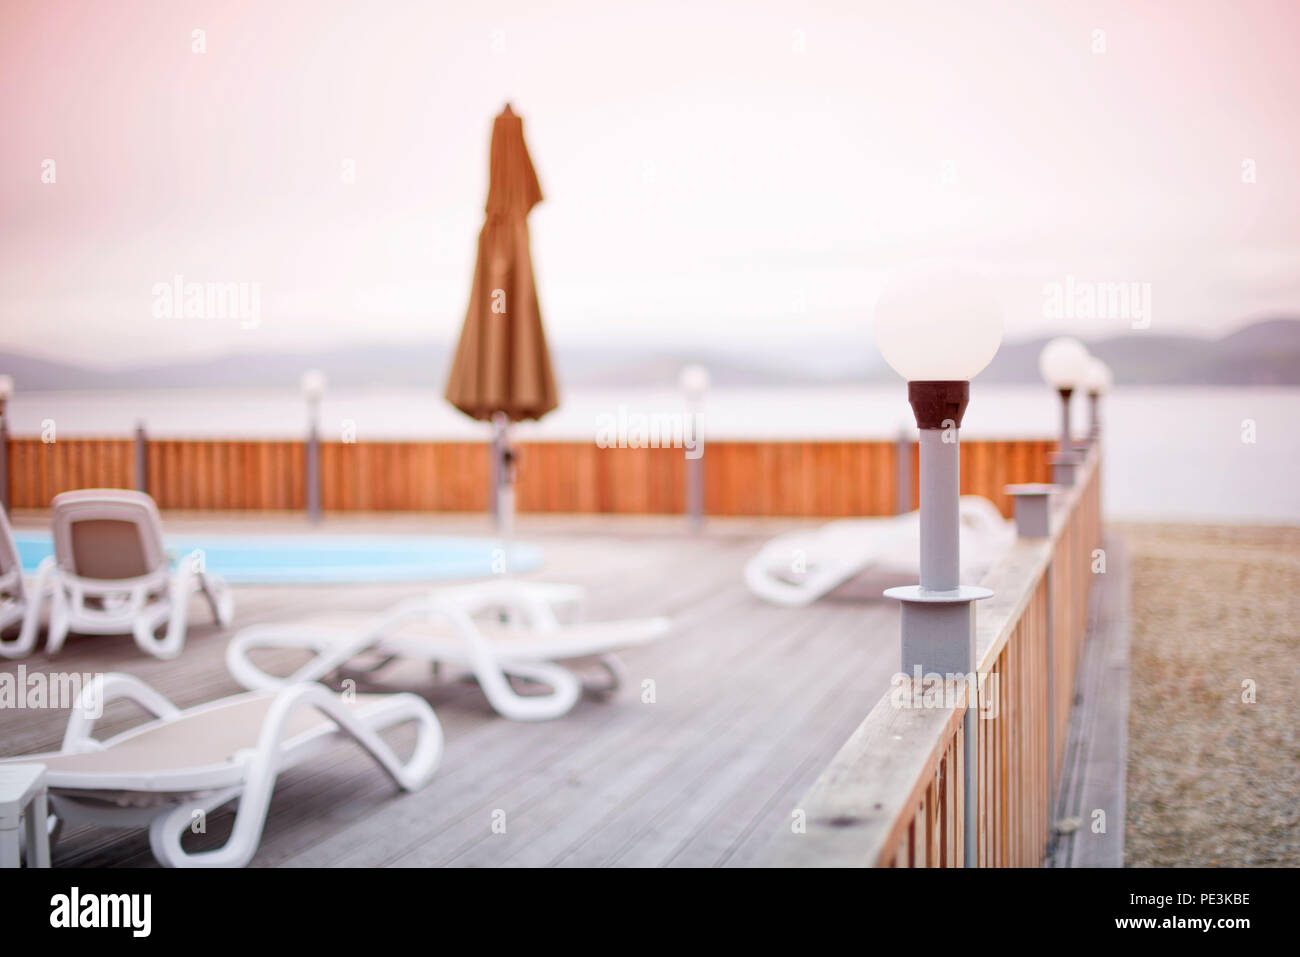 Deck De Madera Playa Mar Ocean Resort Tumbona Sombrilla